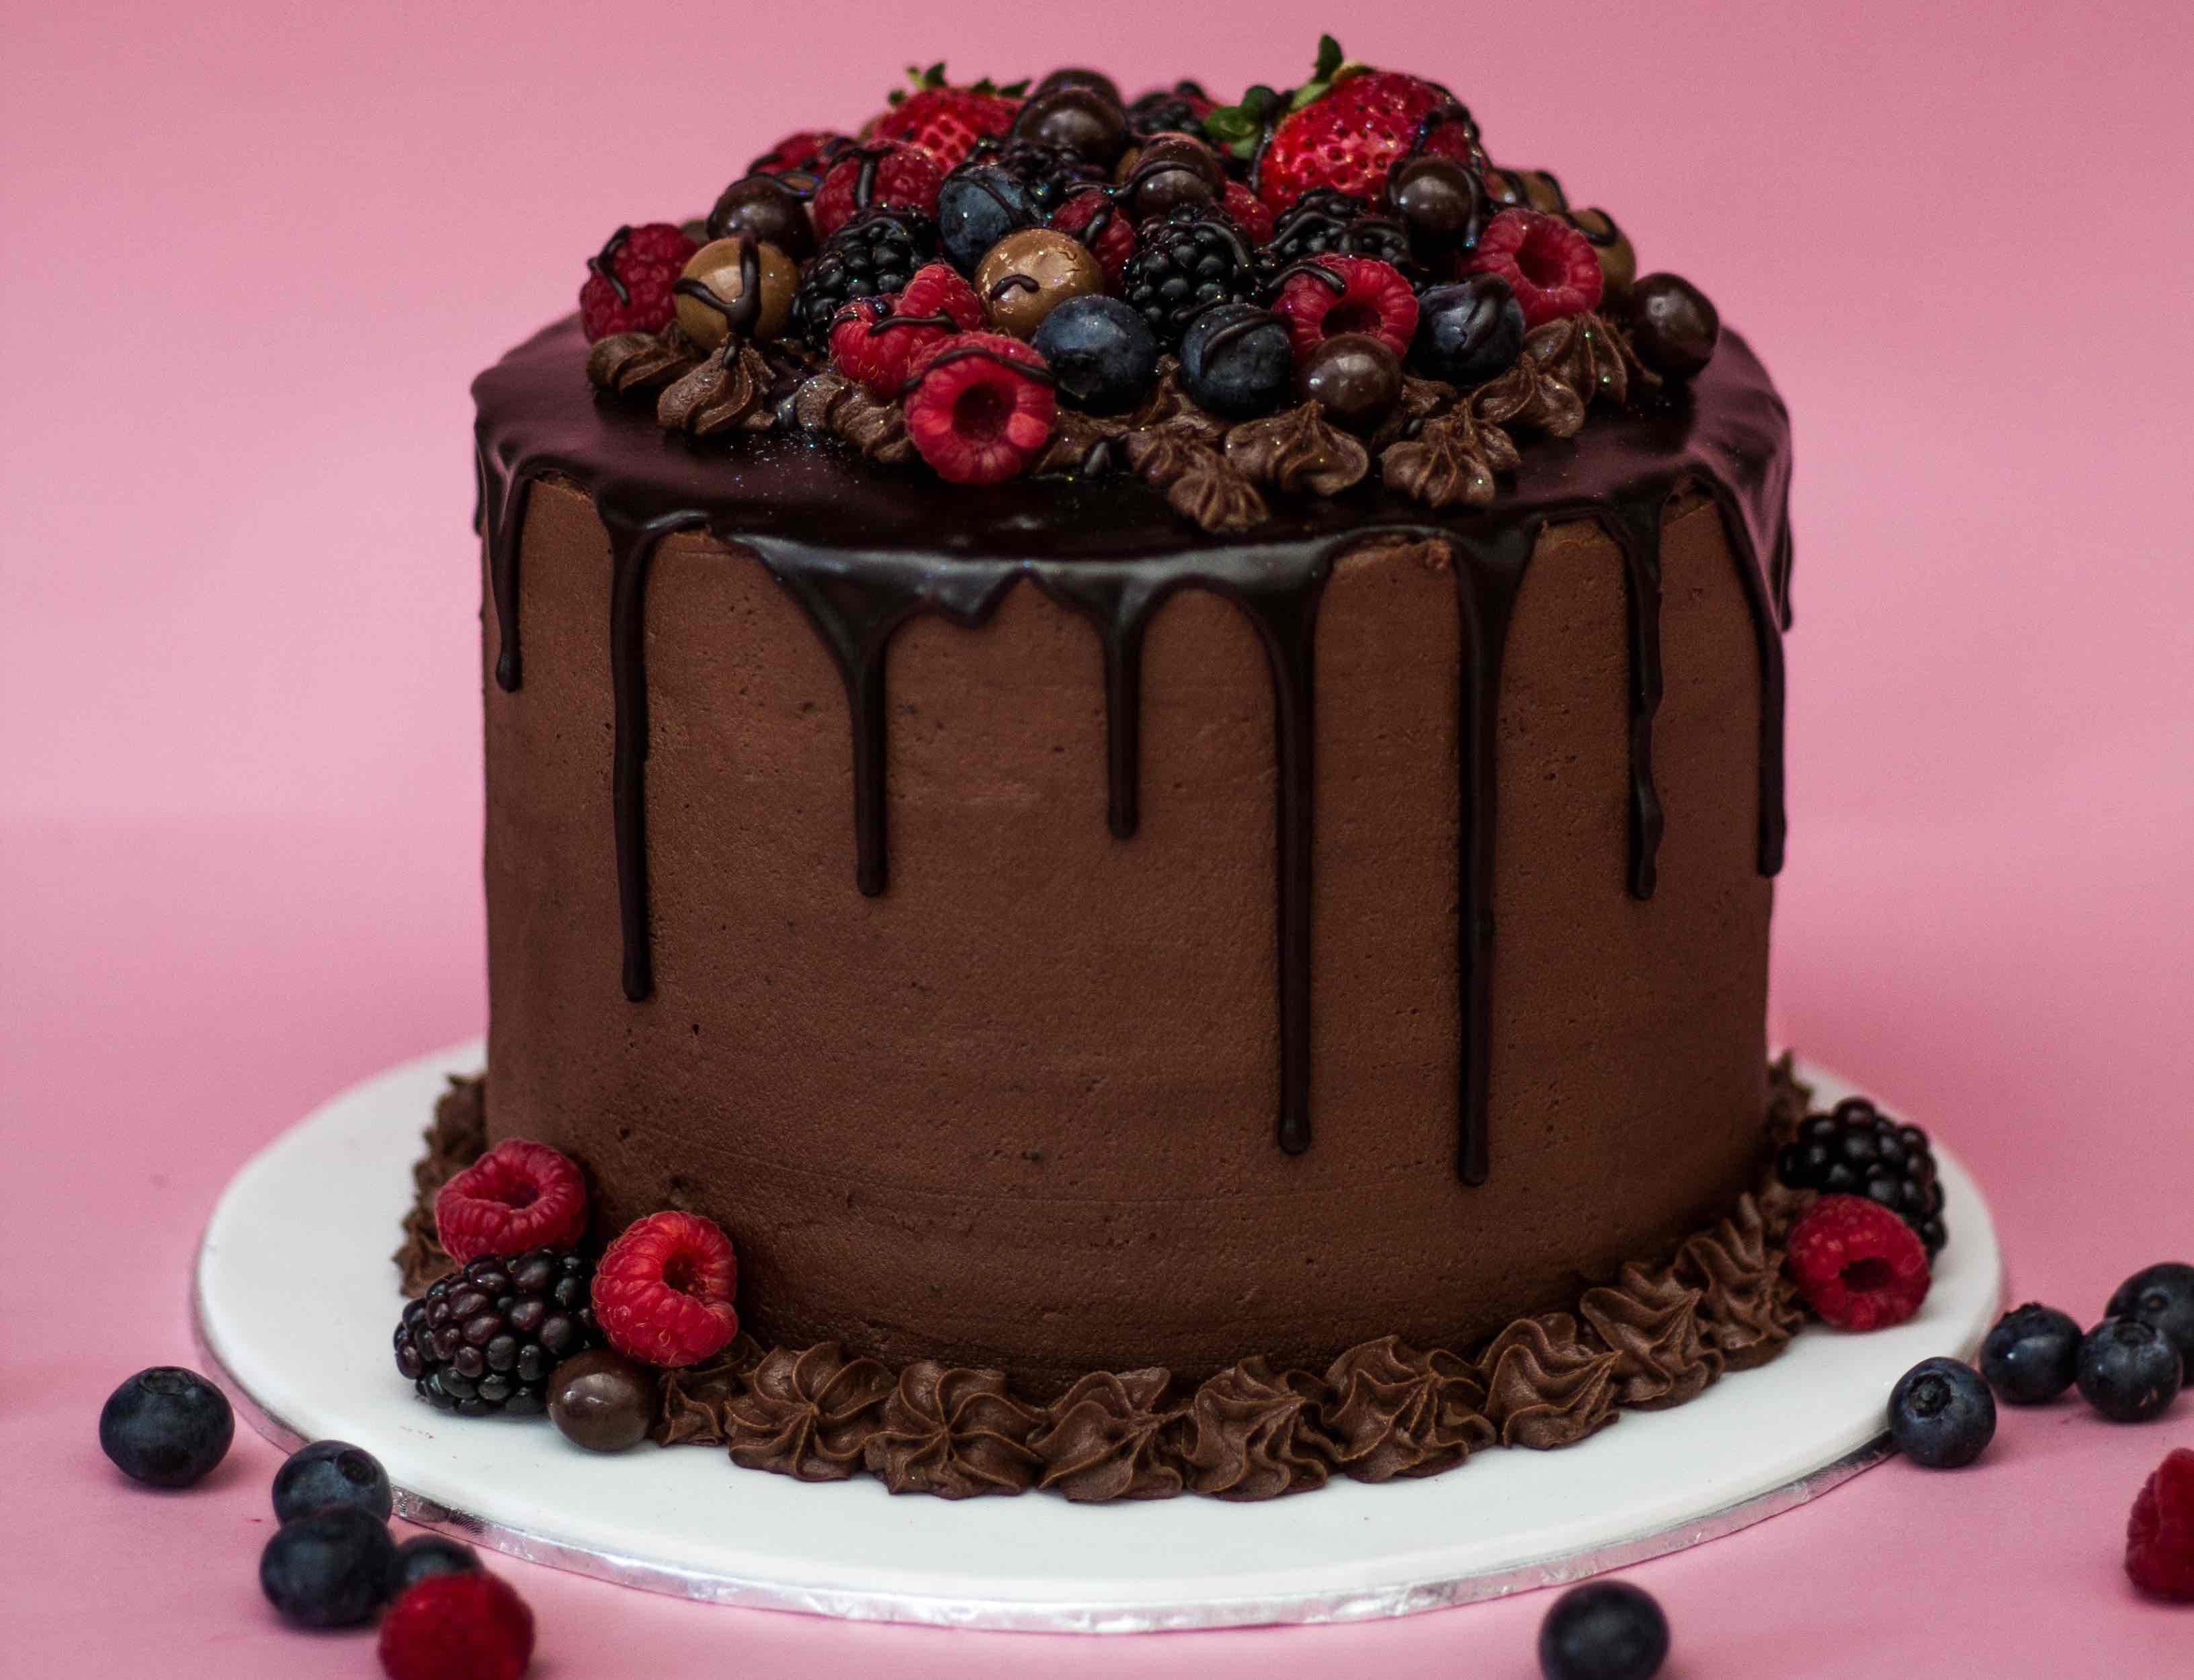 Chocolate cake with ganache drip